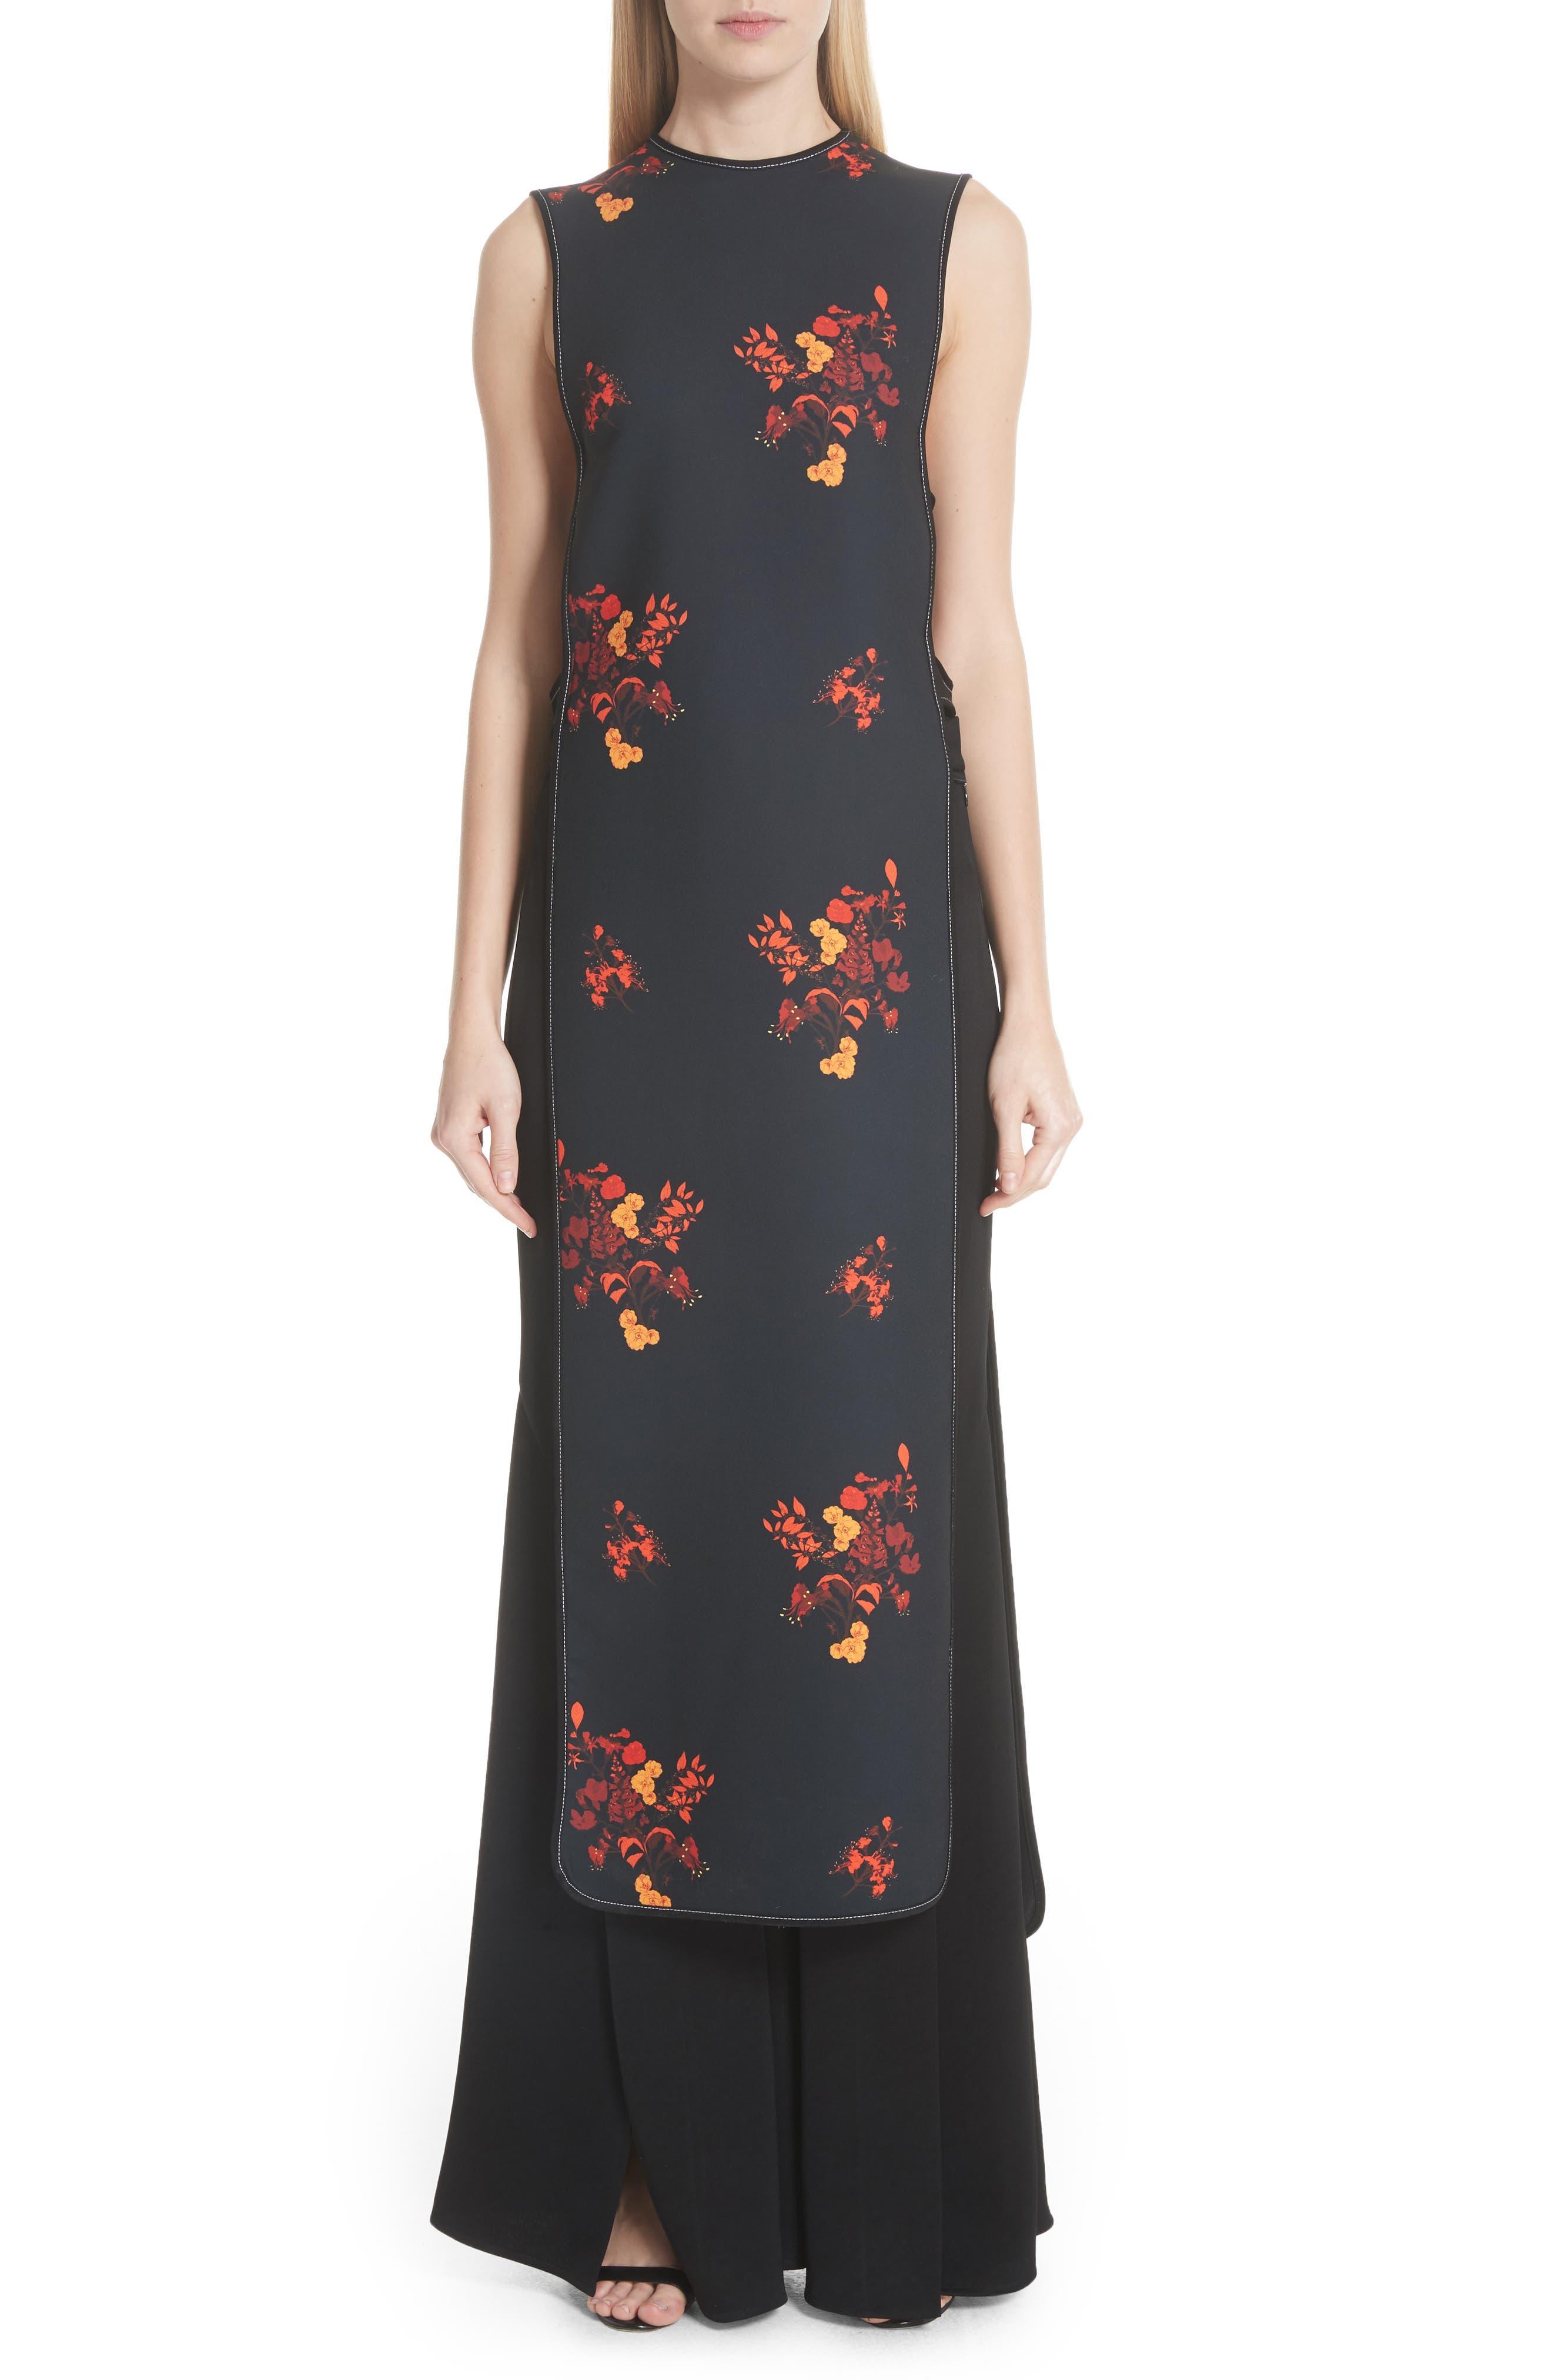 Judy Sleeveless Crepe Tunic Dress,                             Main thumbnail 1, color,                             800